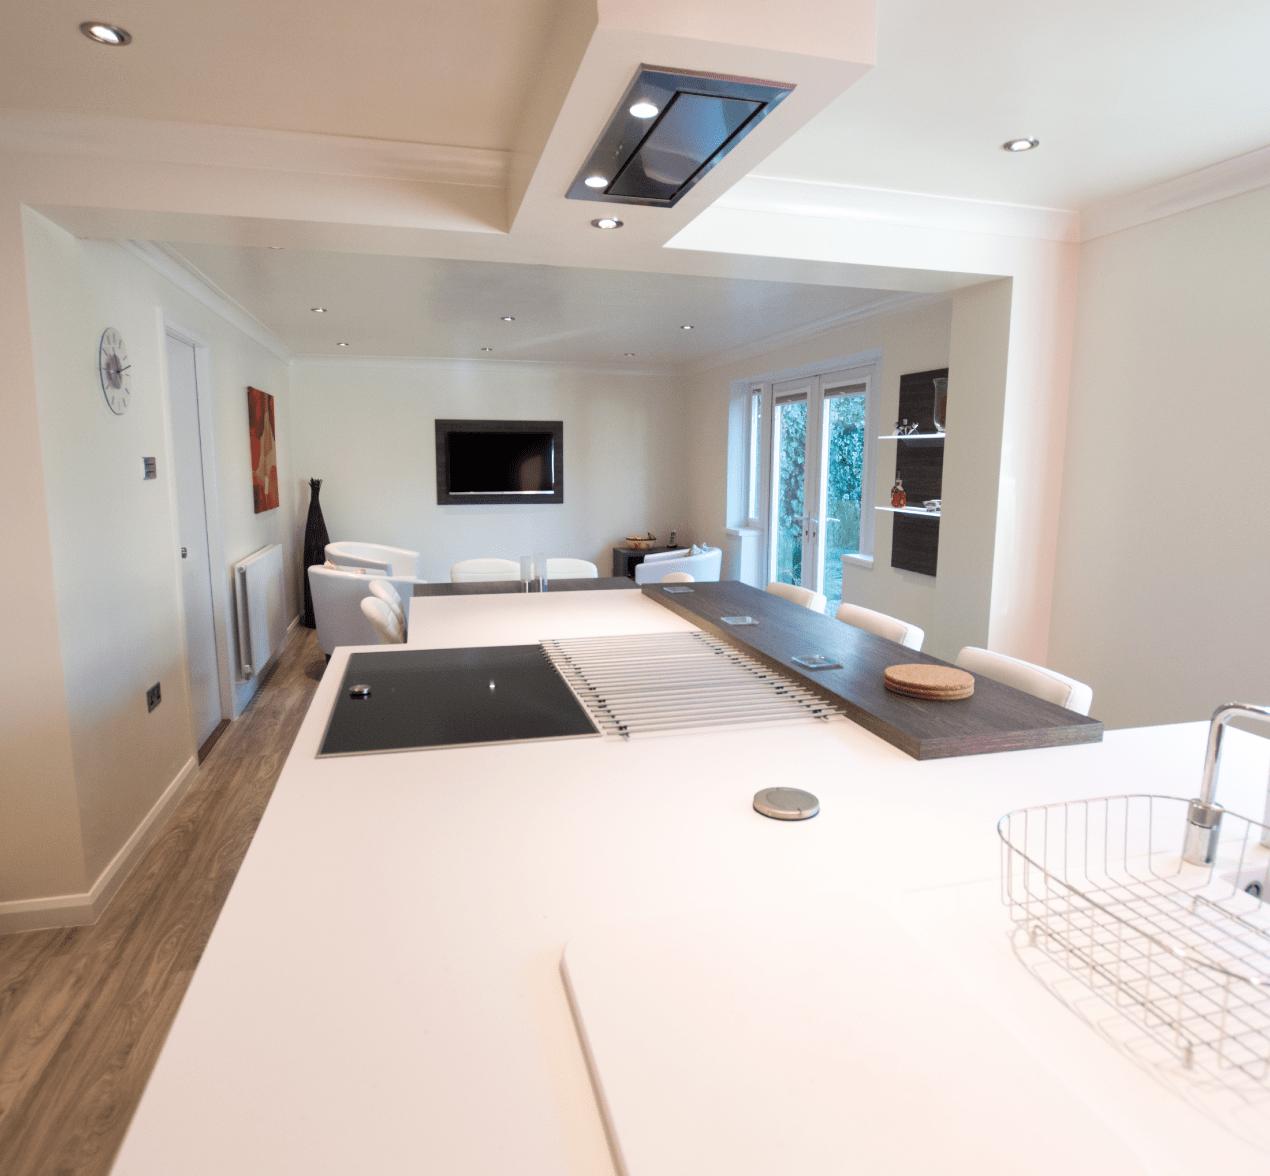 Kitchen Design Centre Audenshaw: A Kitchen That Brings It All Together In Blackburn